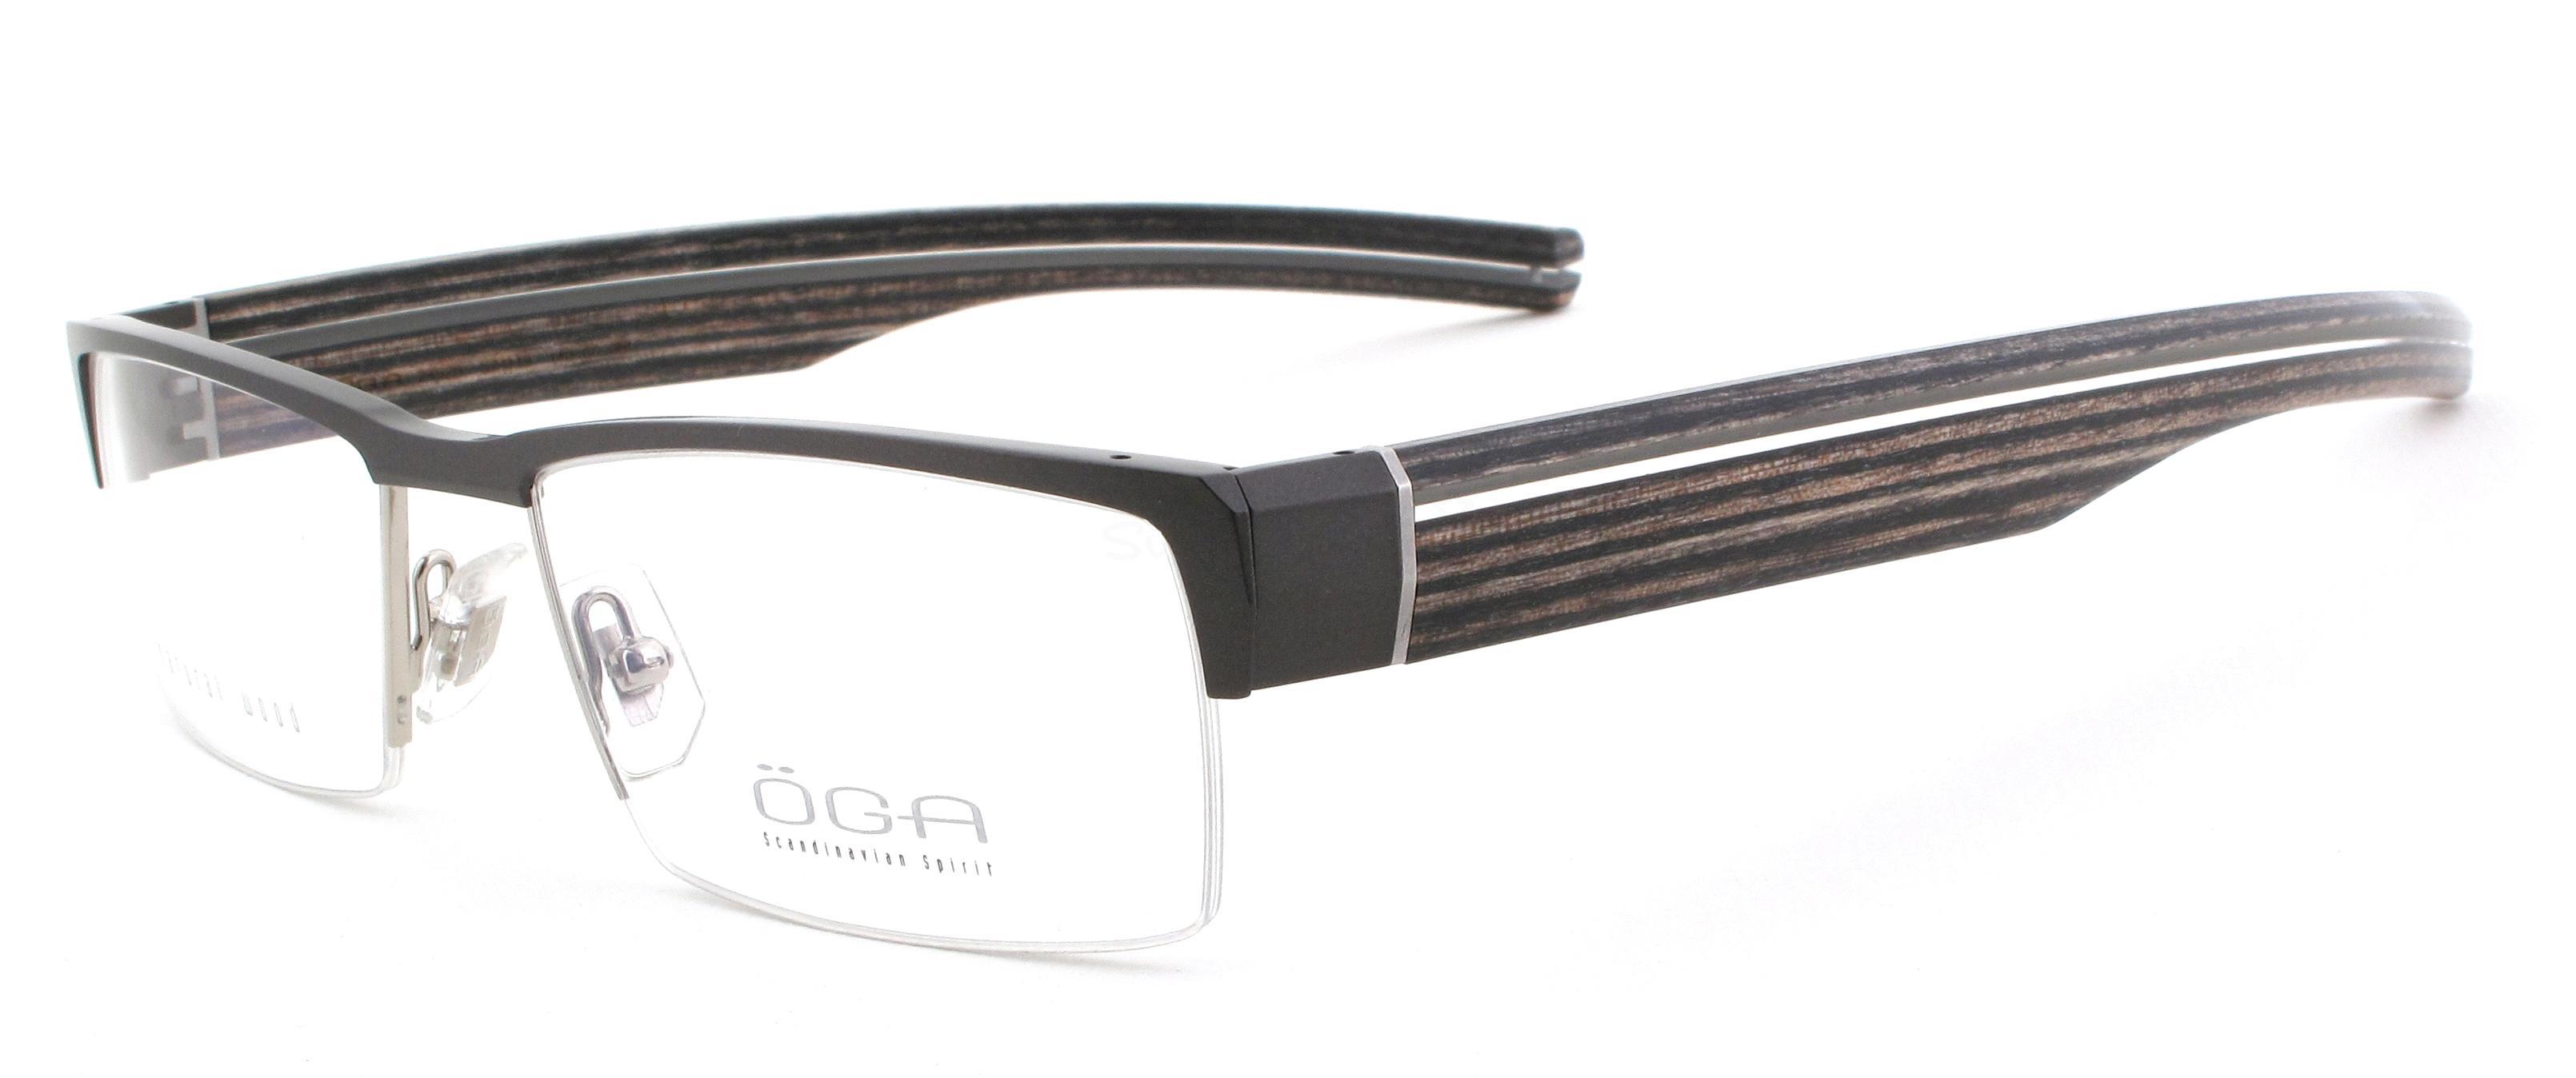 GG061 7452O GLASTRA Glasses, ÖGA Scandinavian Spirit